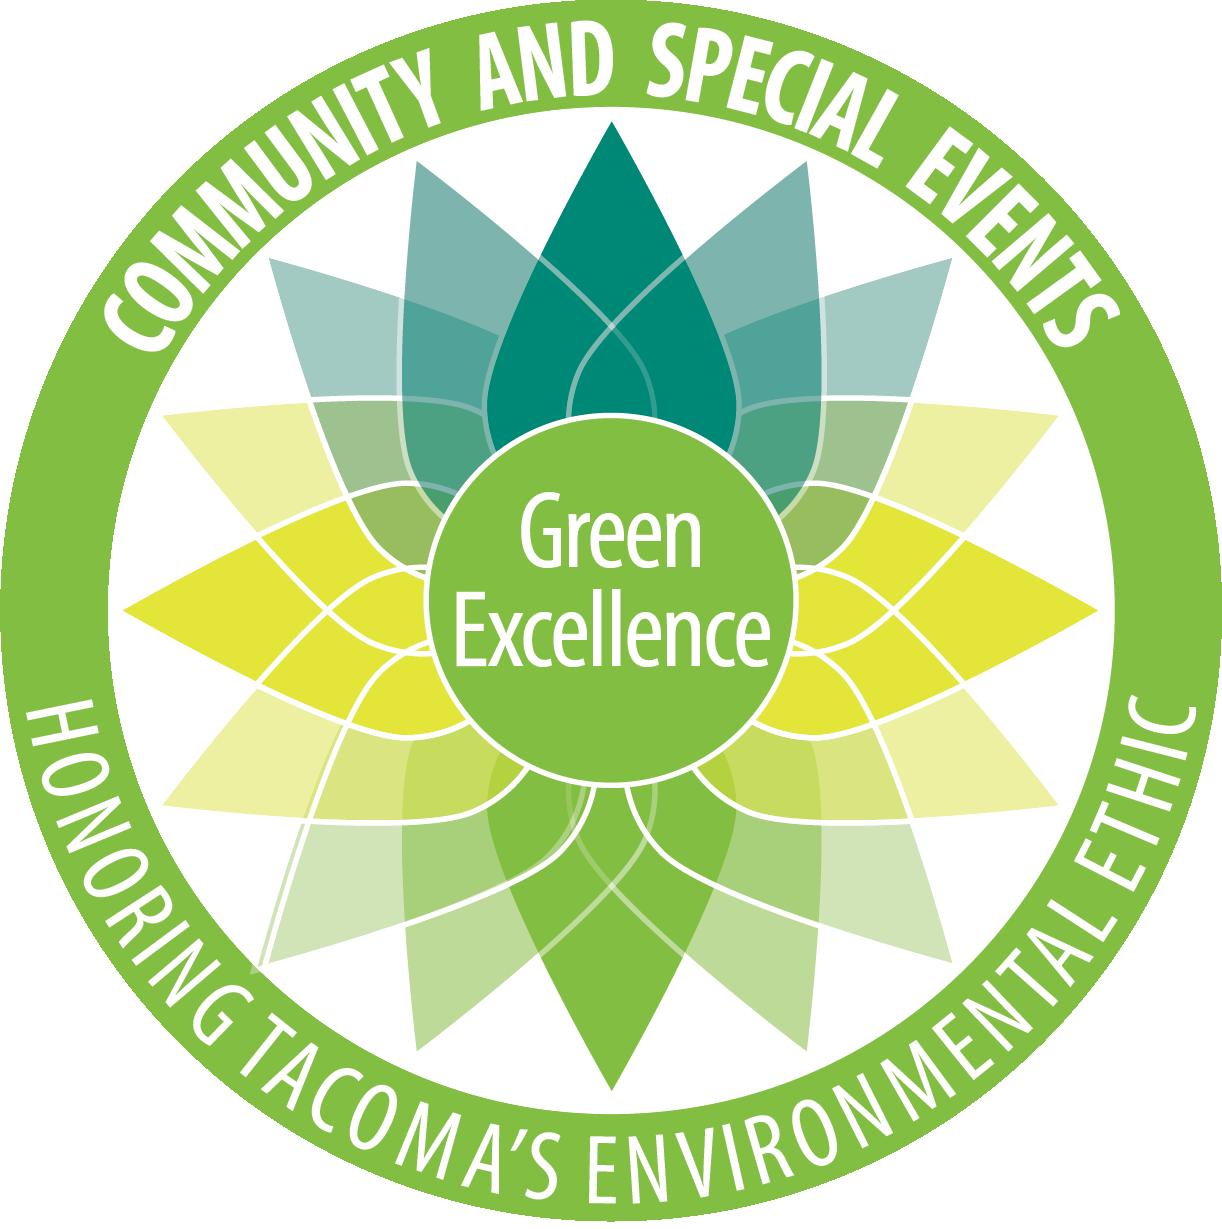 GreenSeal_Comm&SE_GreenExcellence_Print_300dpi